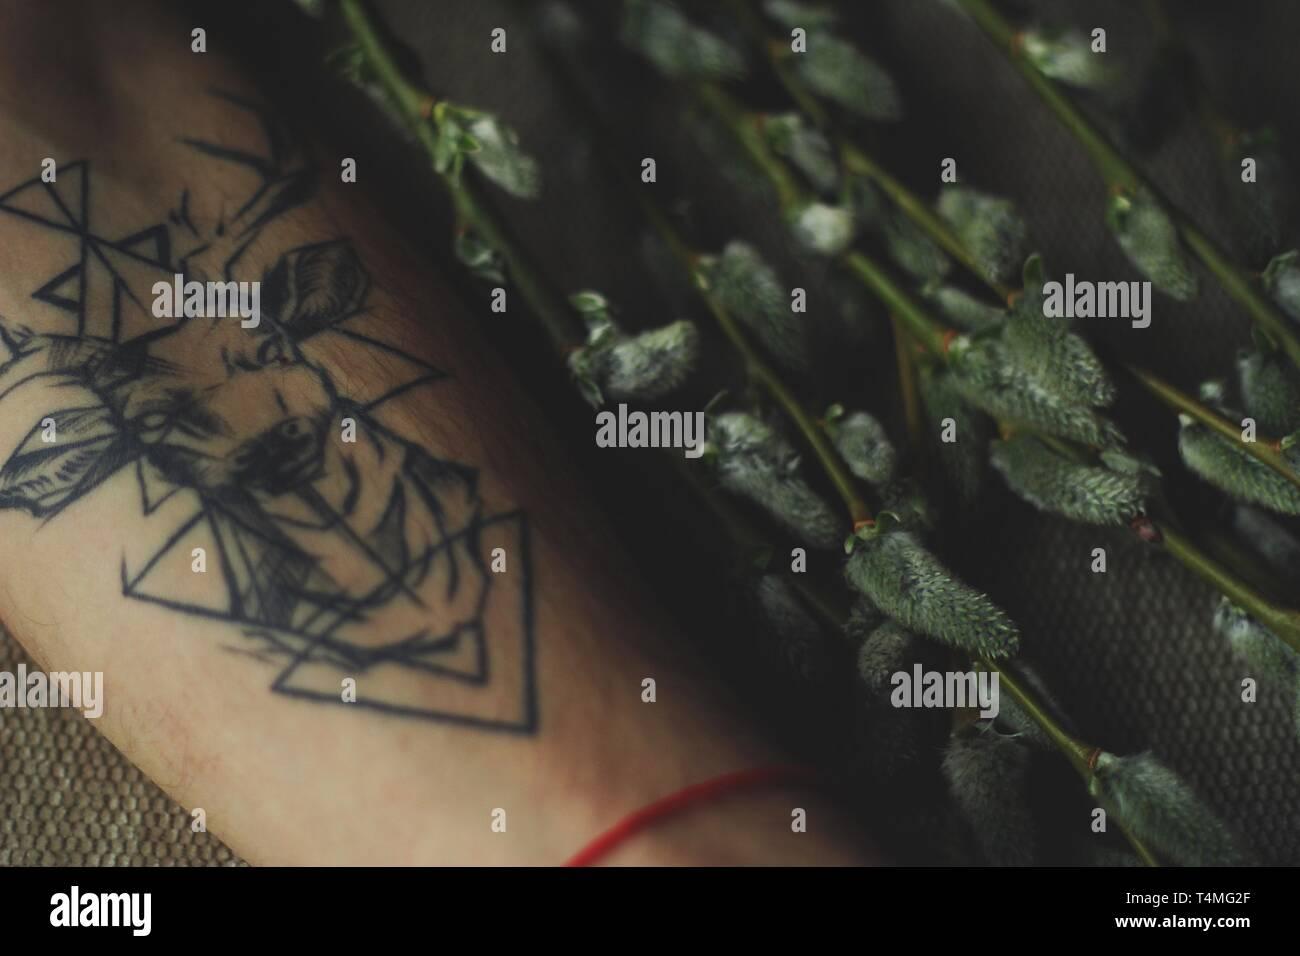 Tattoo On Forearm Imágenes De Stock Tattoo On Forearm Fotos De